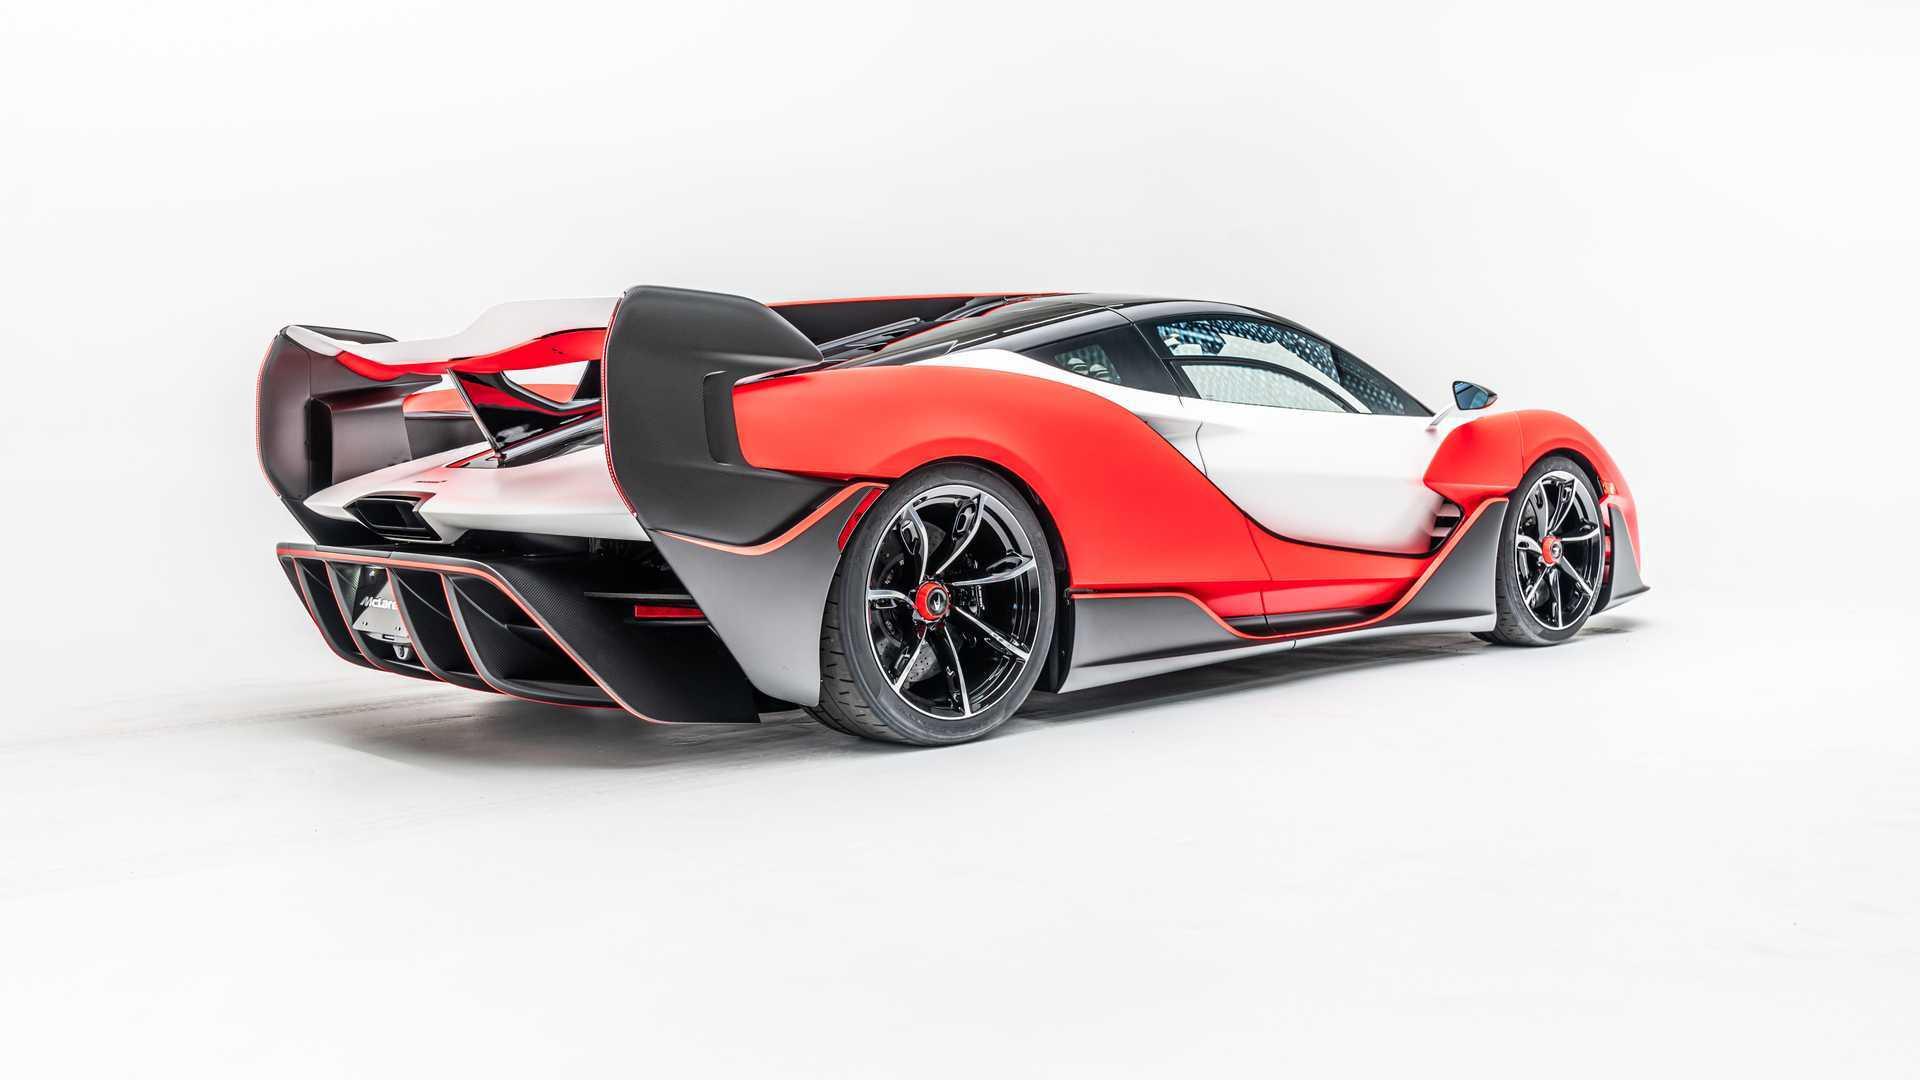 2021 McLaren Sabre Rear